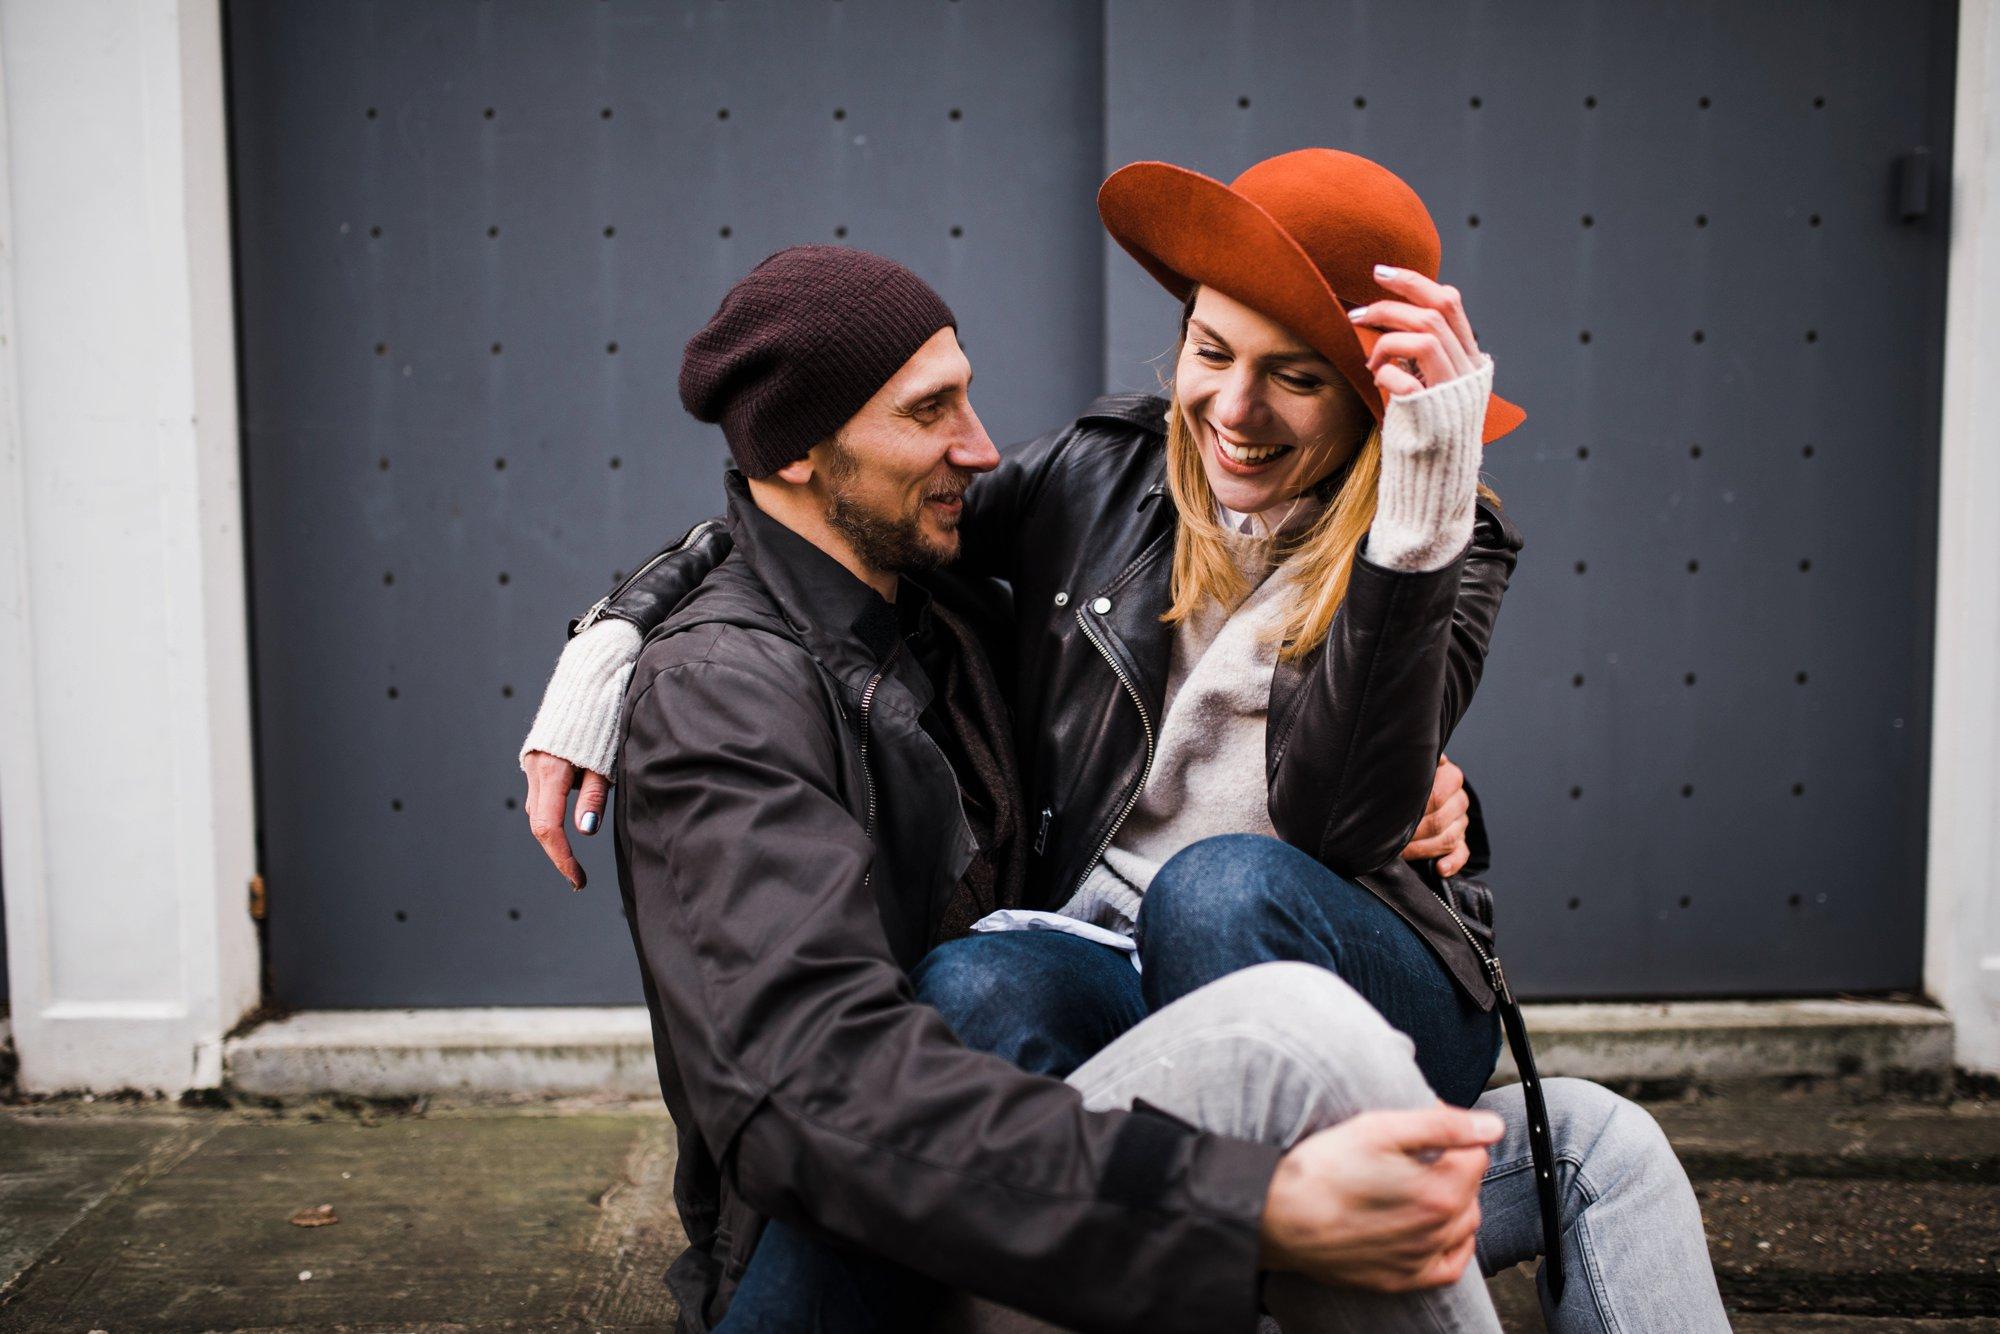 engagement-photos-london_0018.jpg